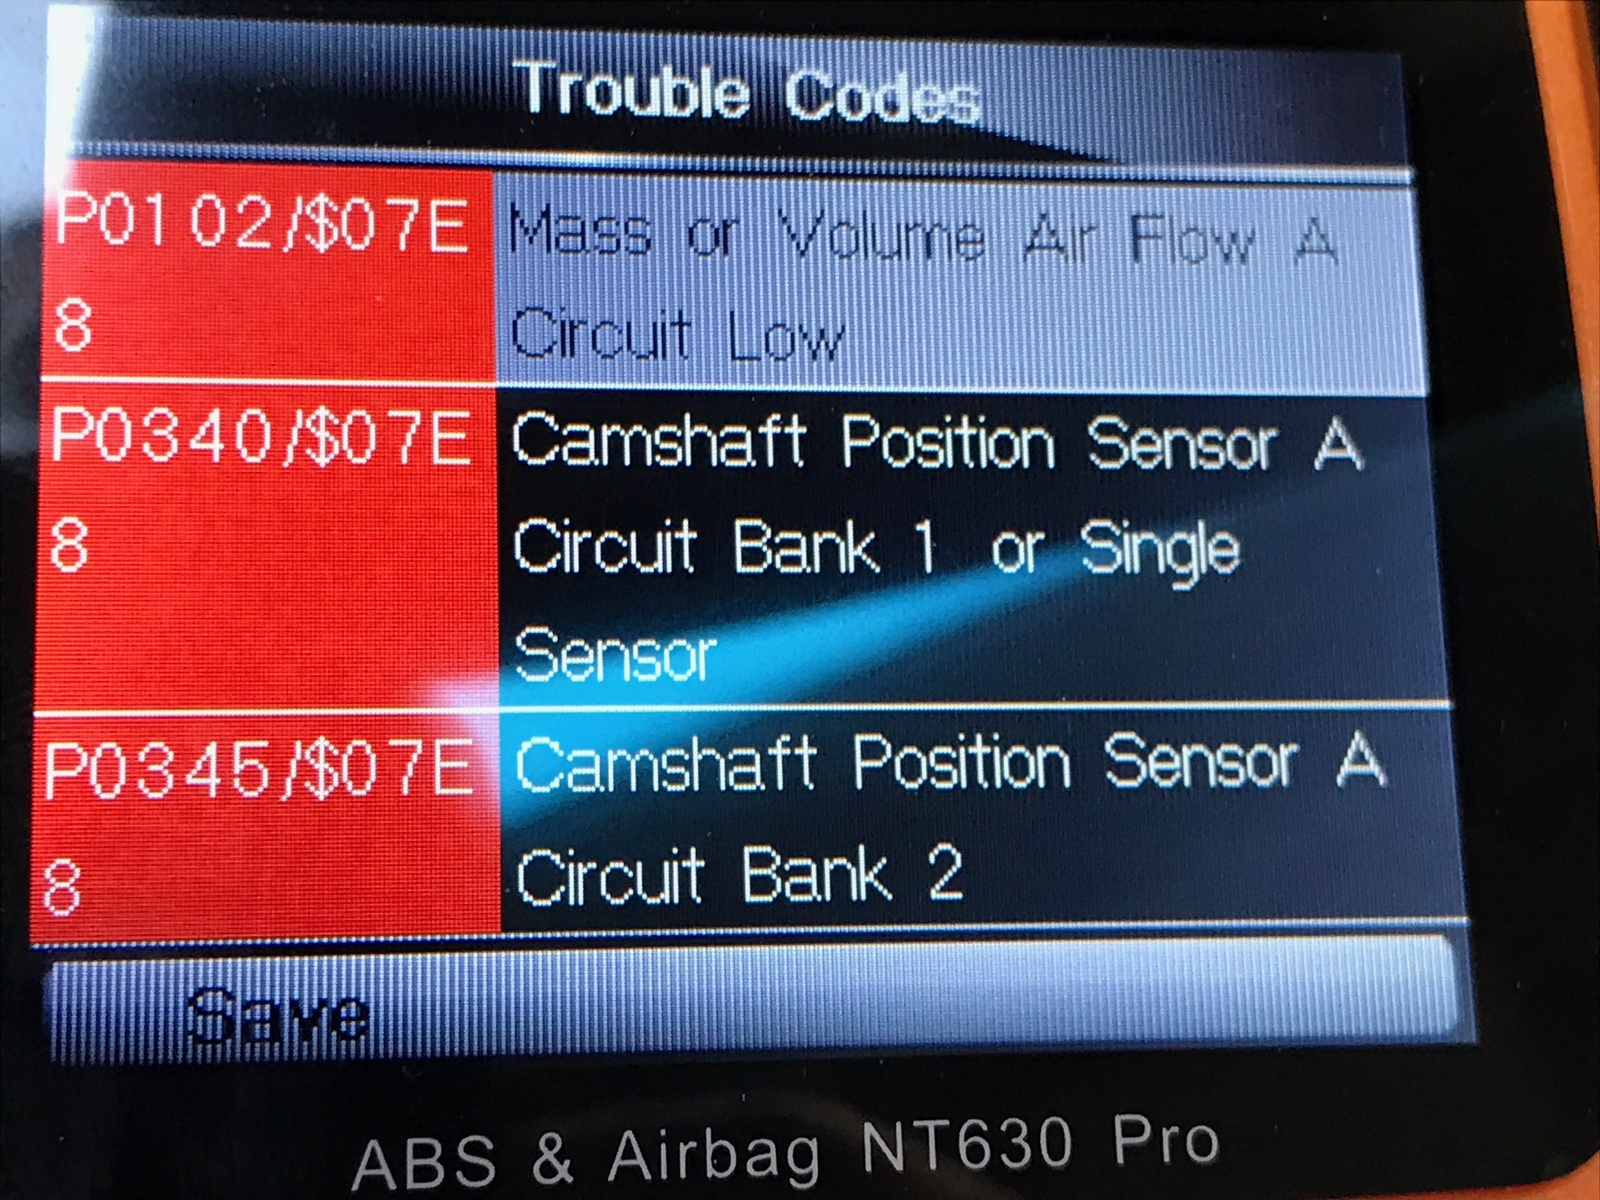 hight resolution of p0340 07e camshaft position sensor a circuit bank 1 or single sensor p0345 07e camshaft position sensor a circuit bank 2 or single sensor